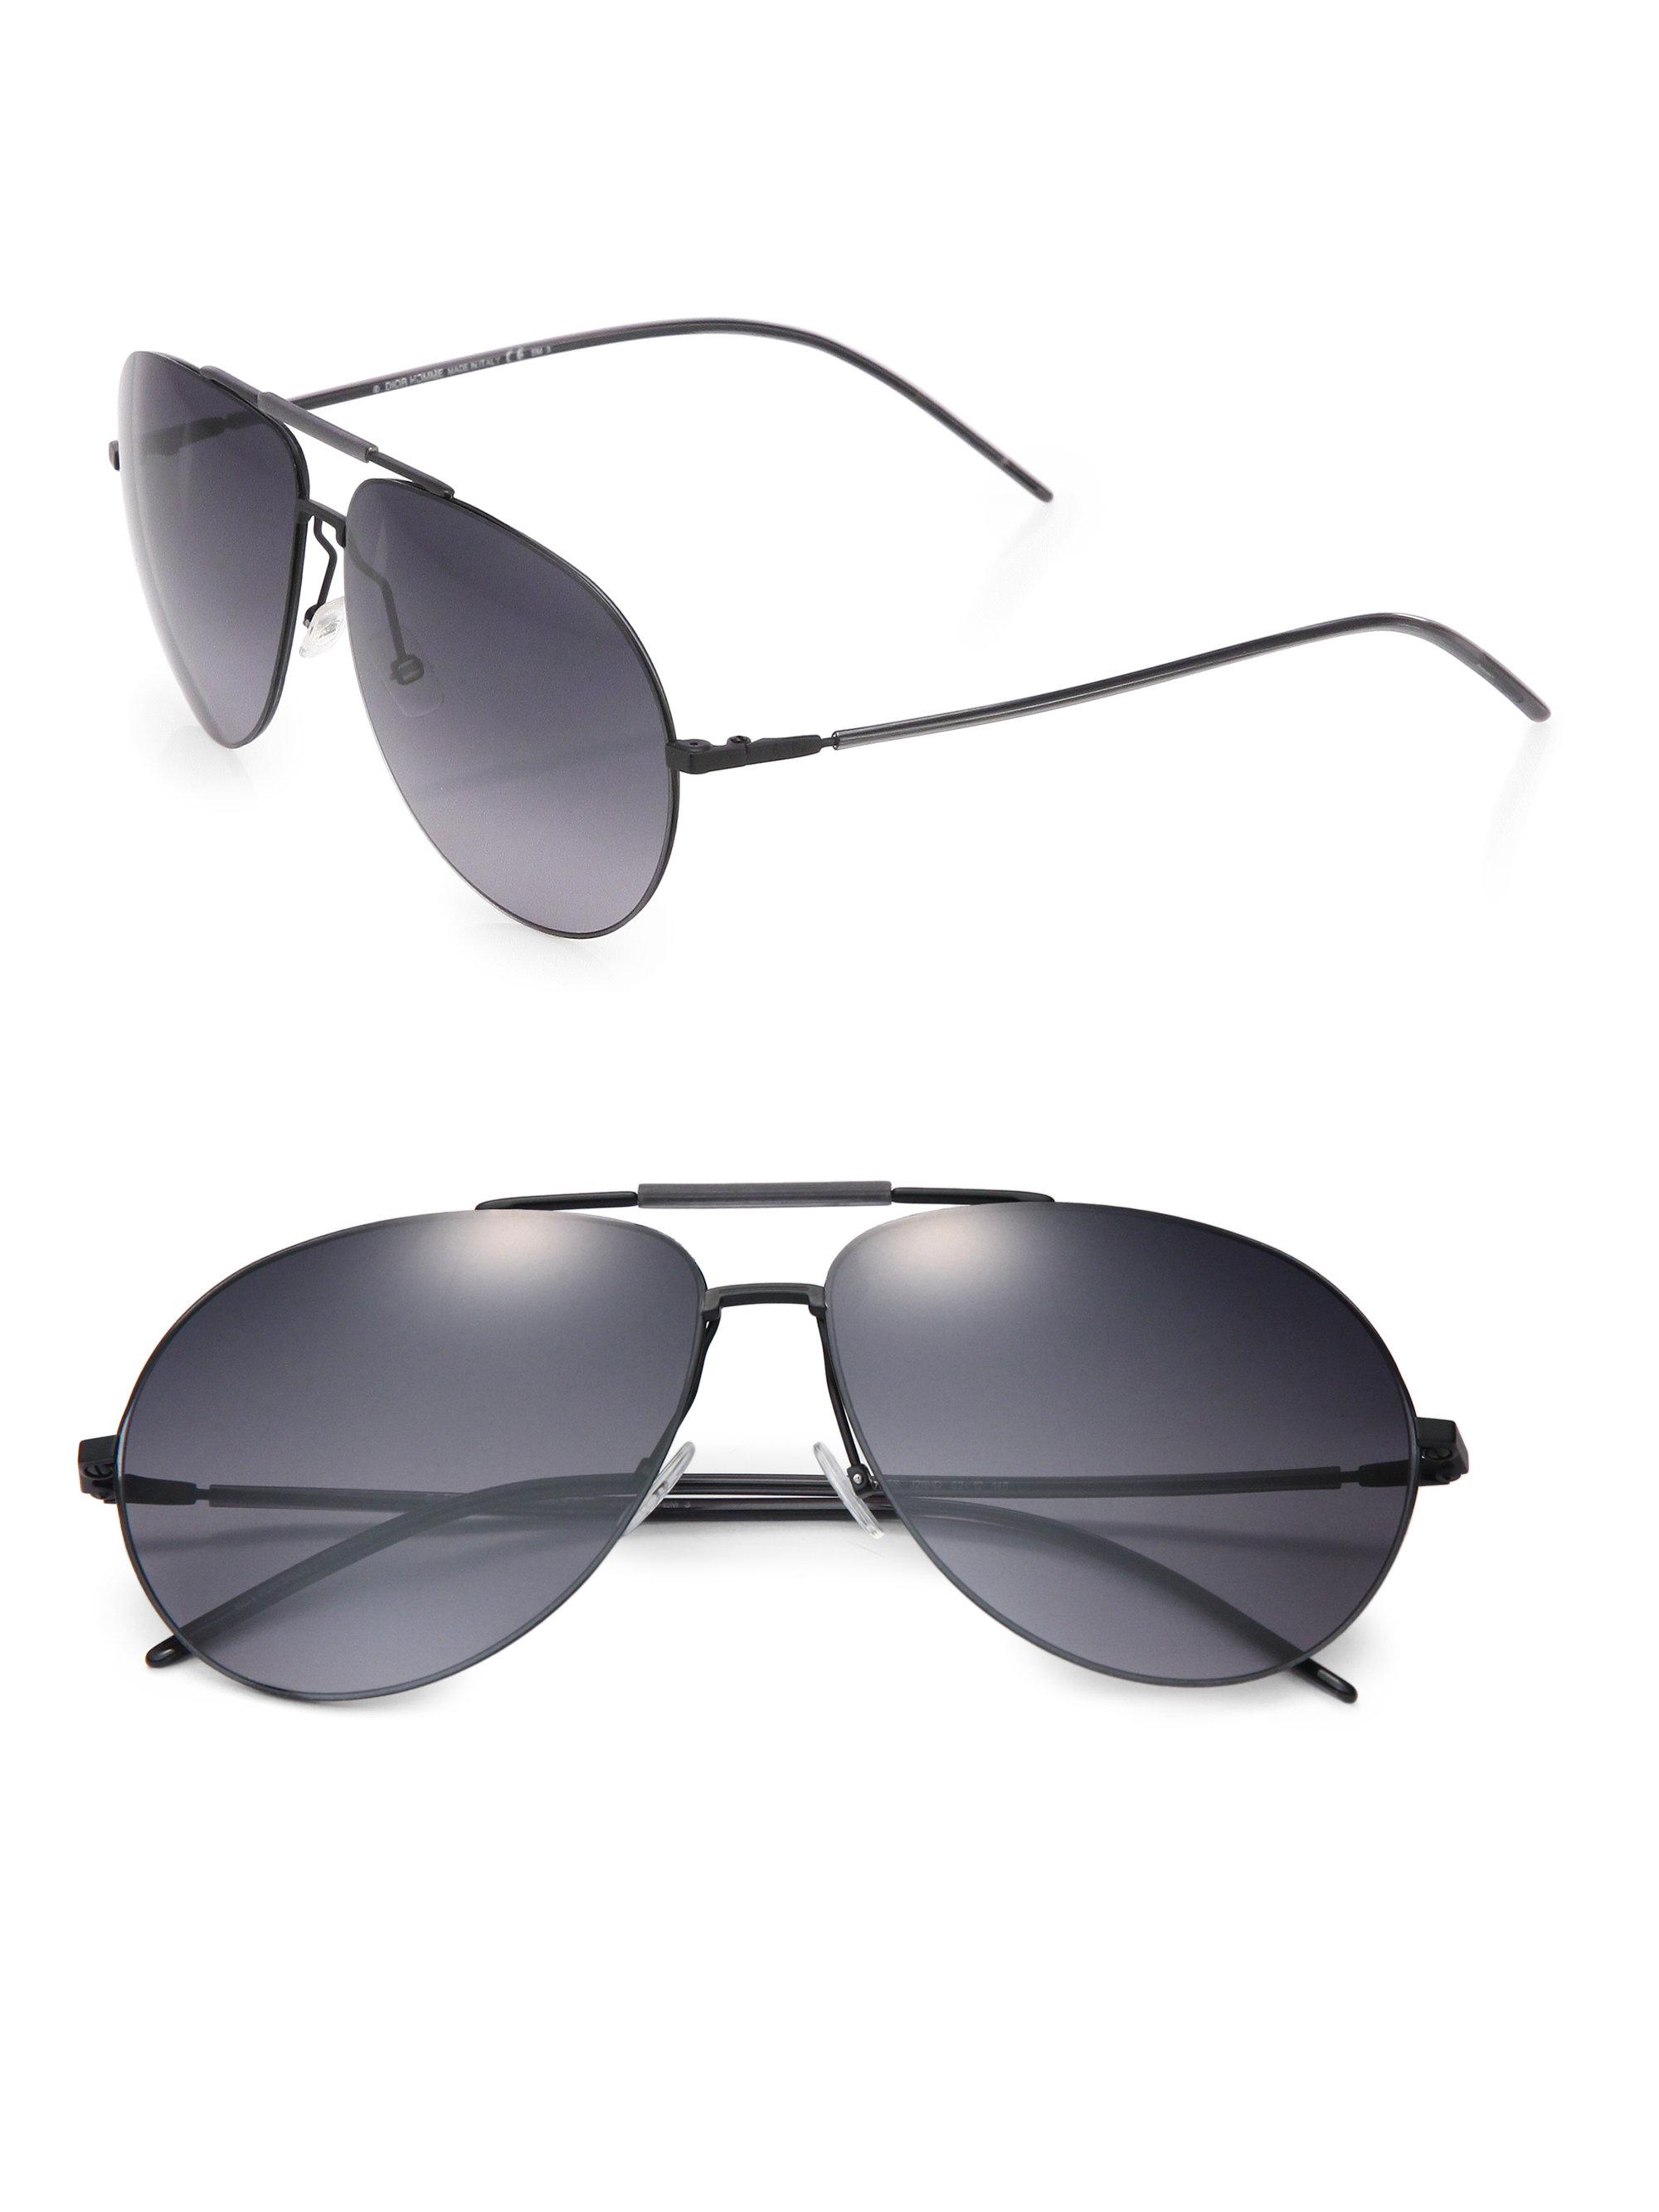 58cd313dfb Gianfranco Ferre Mens Black Aviator Sunglasses | United Nations ...